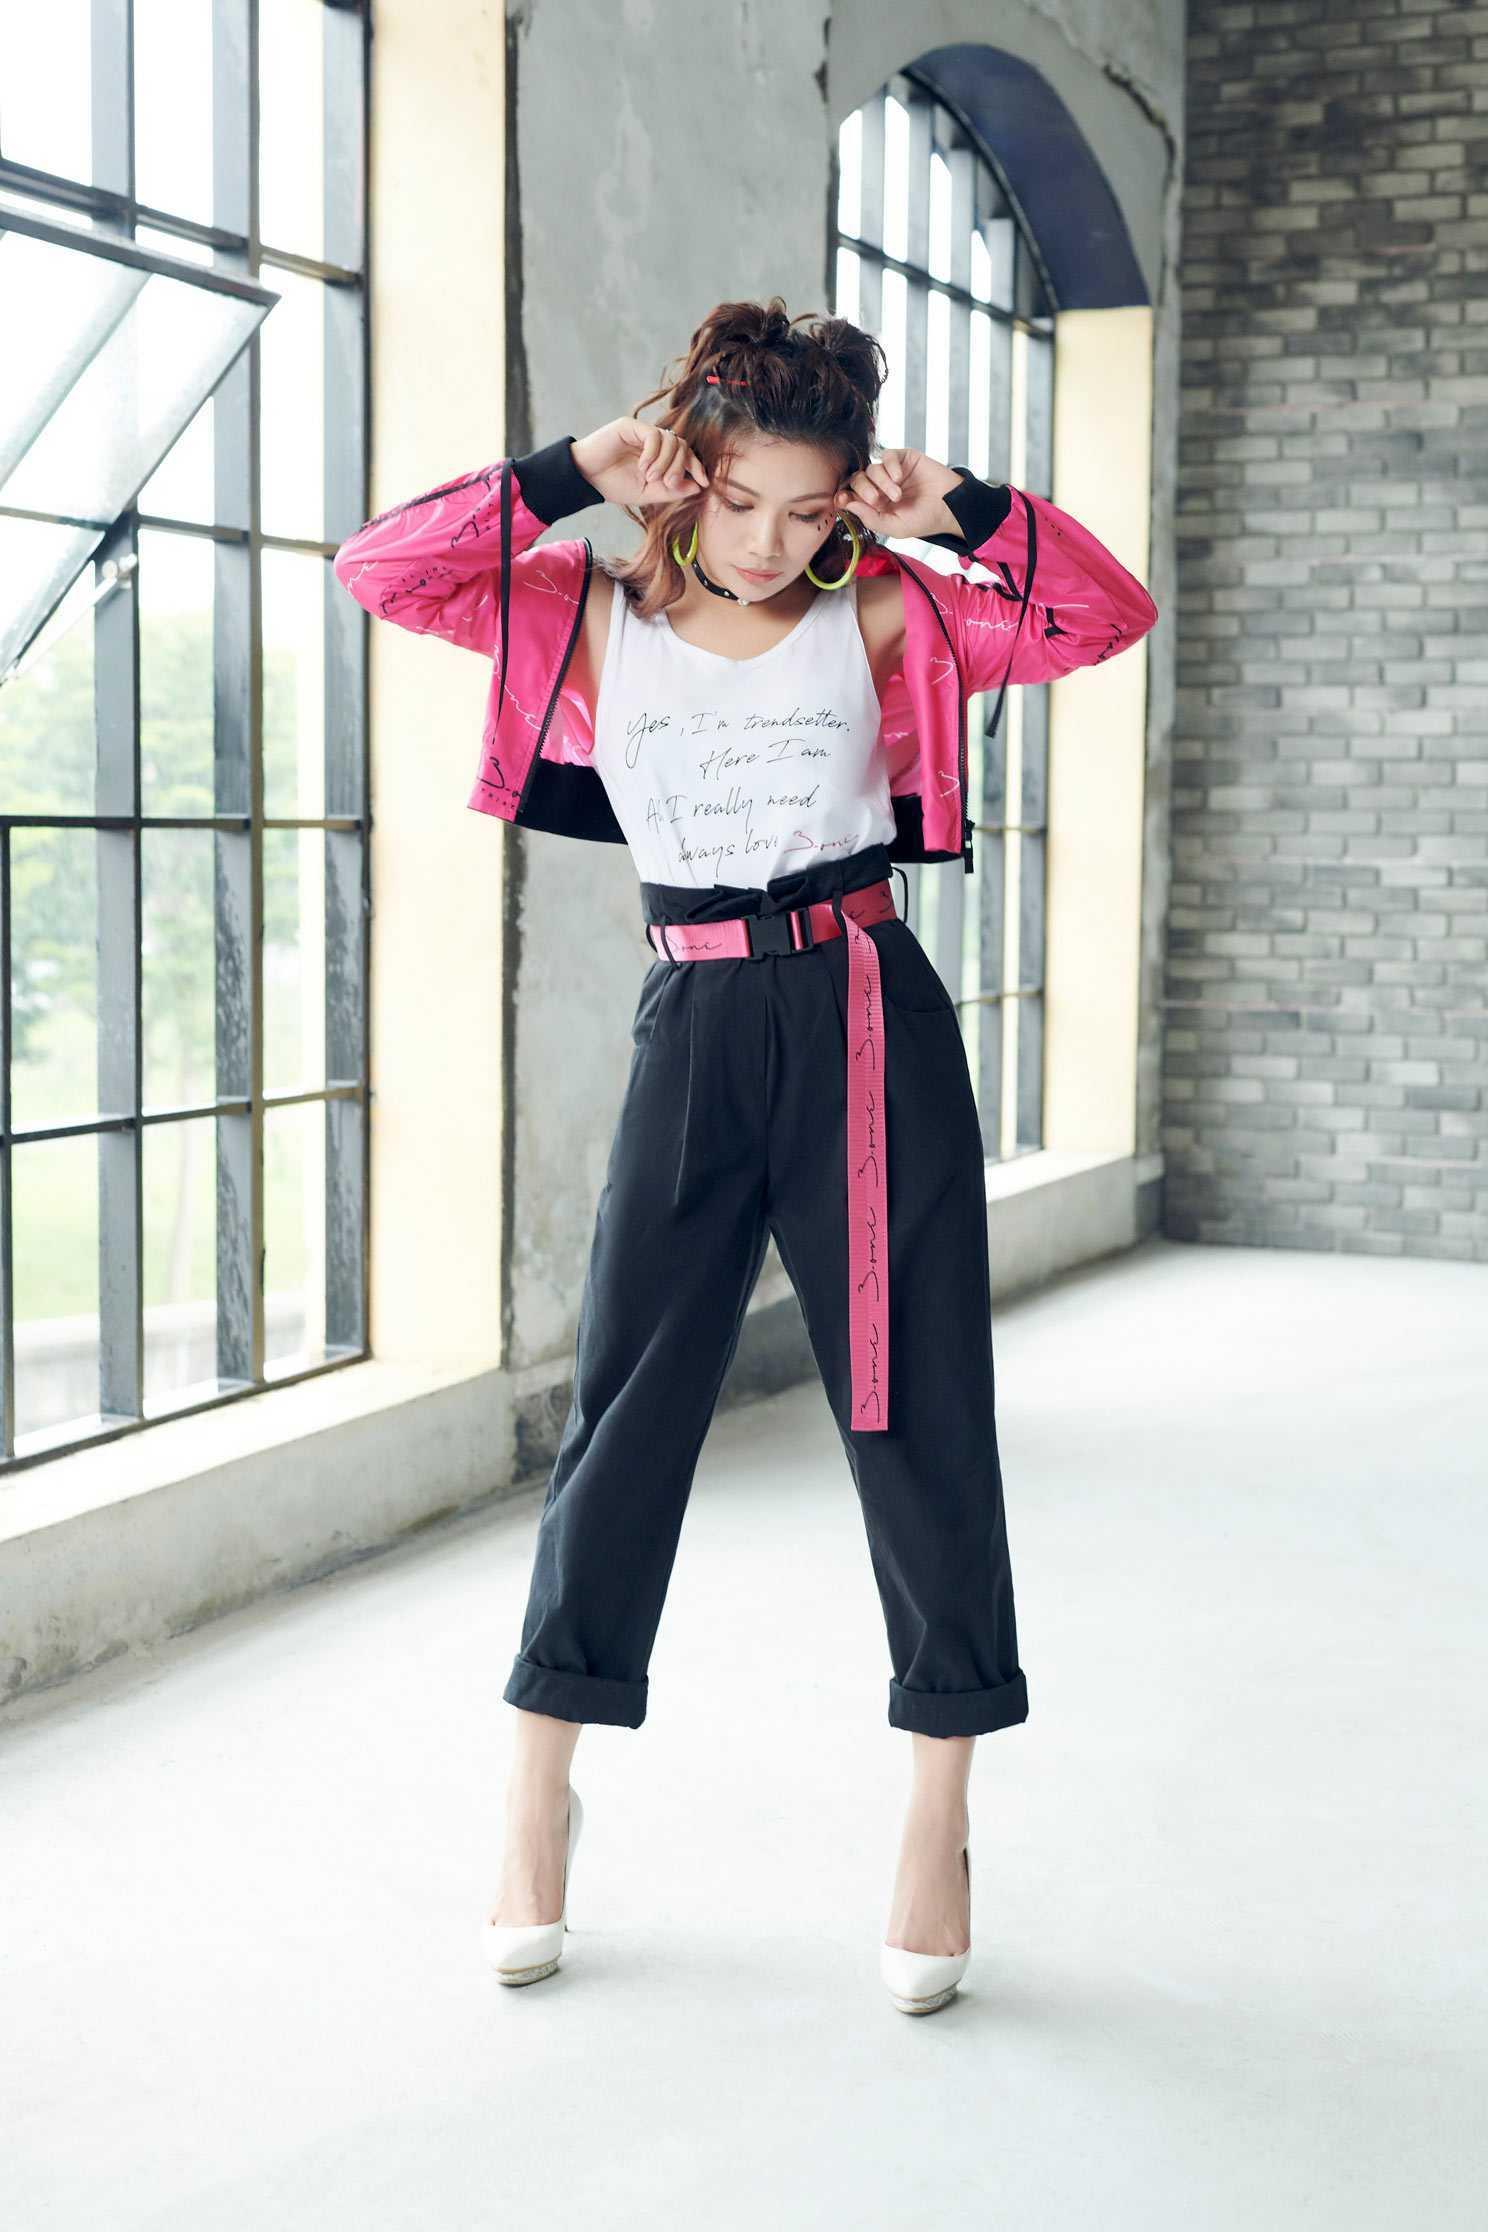 iRoo x 3.one Fashion logo designed culottes